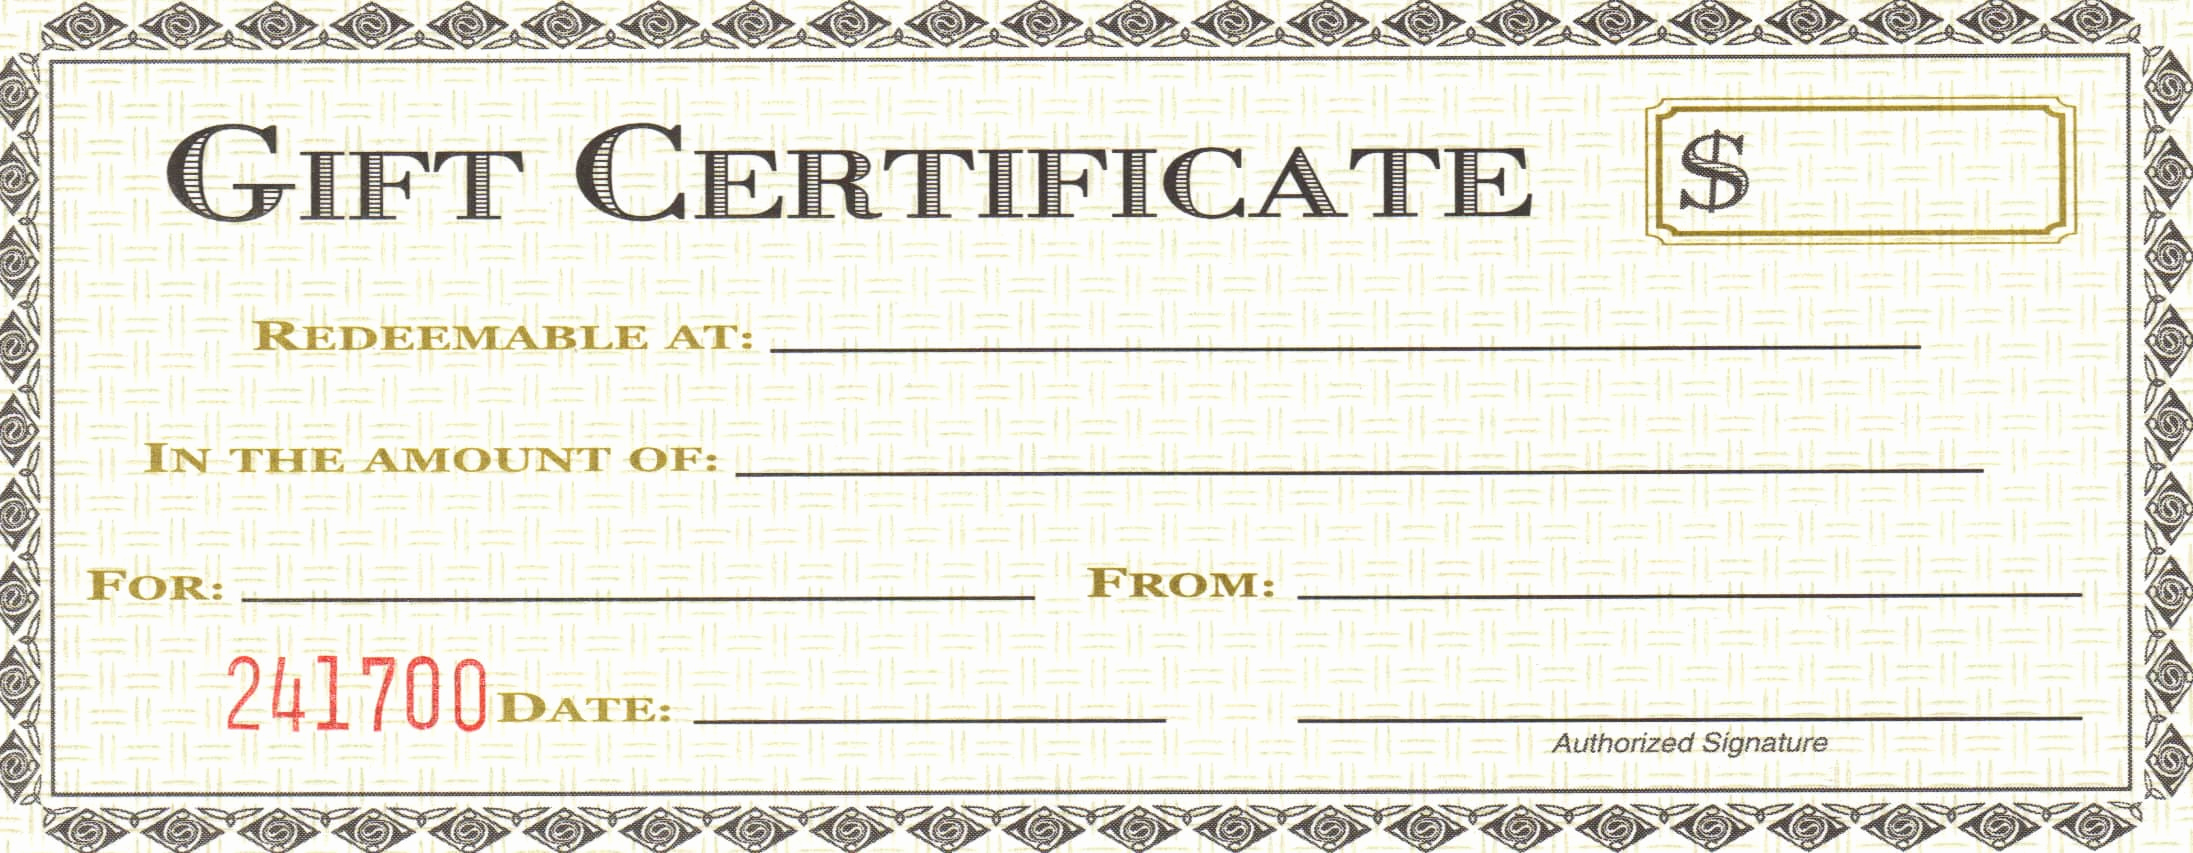 Custom Gift Certificate Template Free Luxury 18 Gift Certificate Templates Excel Pdf formats